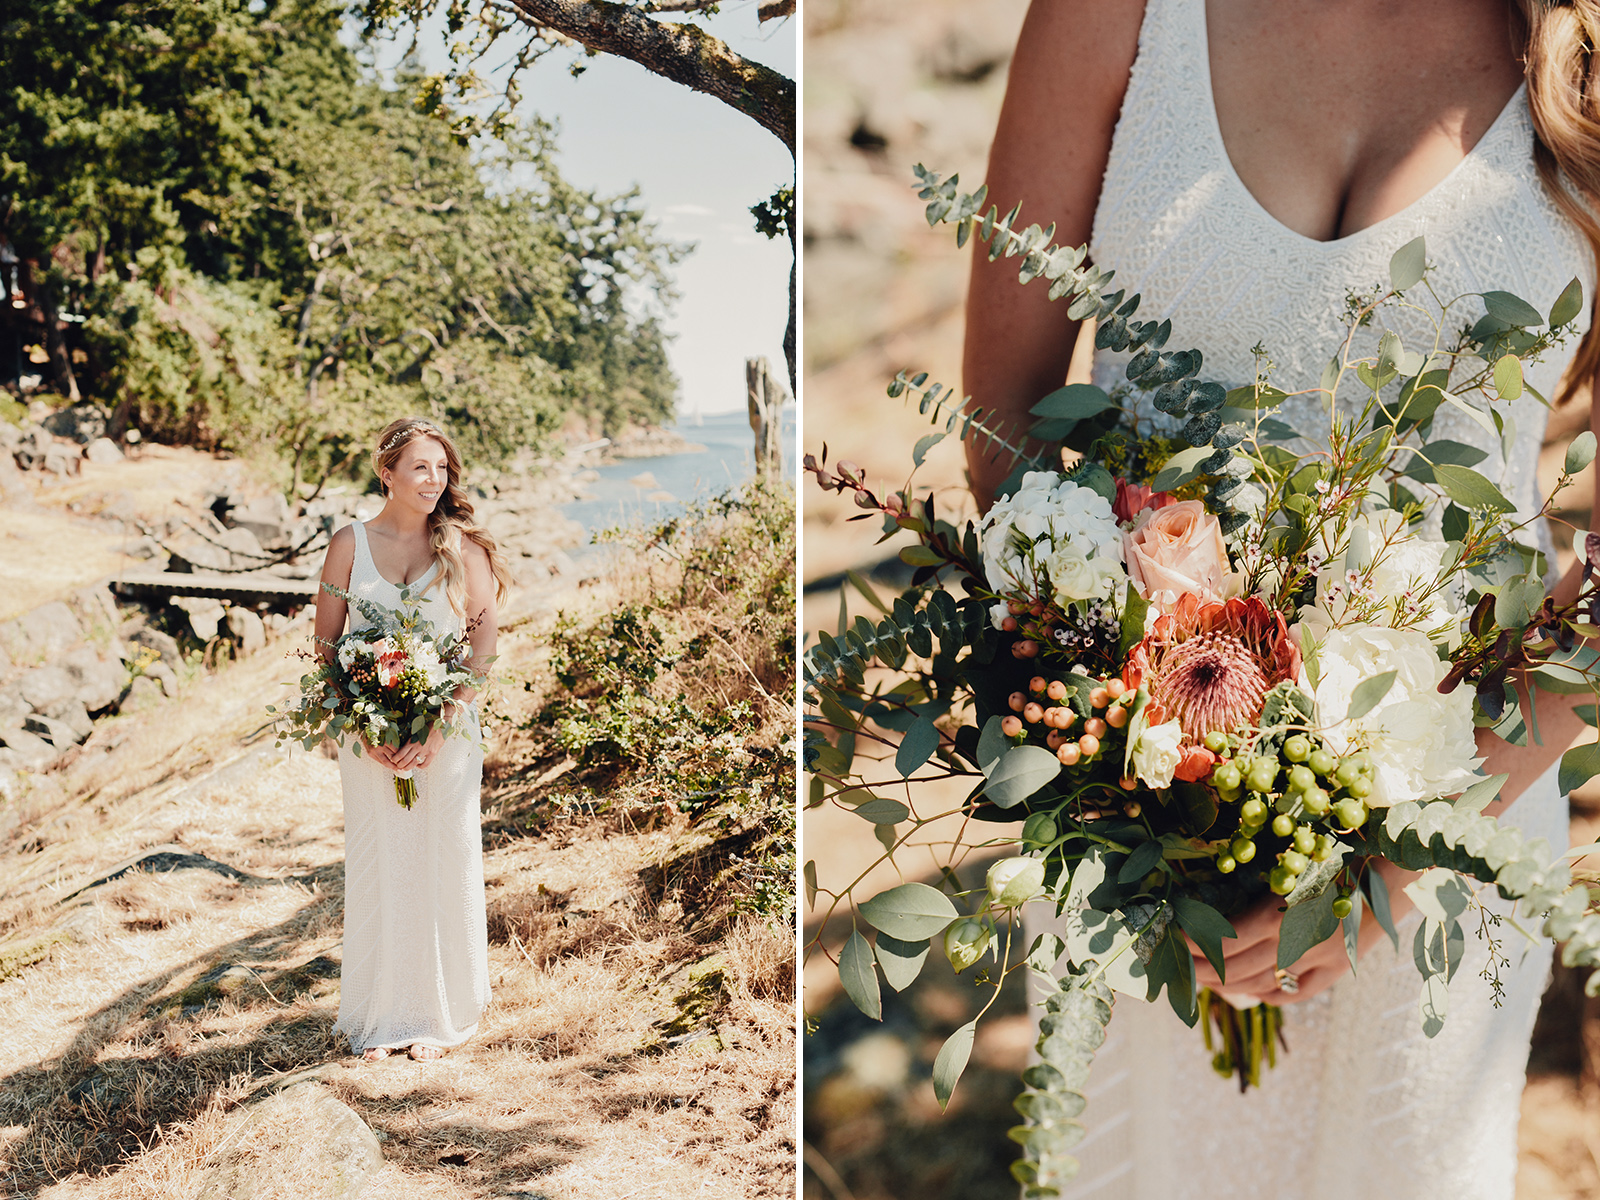 galiano-island-bodega-destination-wedding-0042.JPG